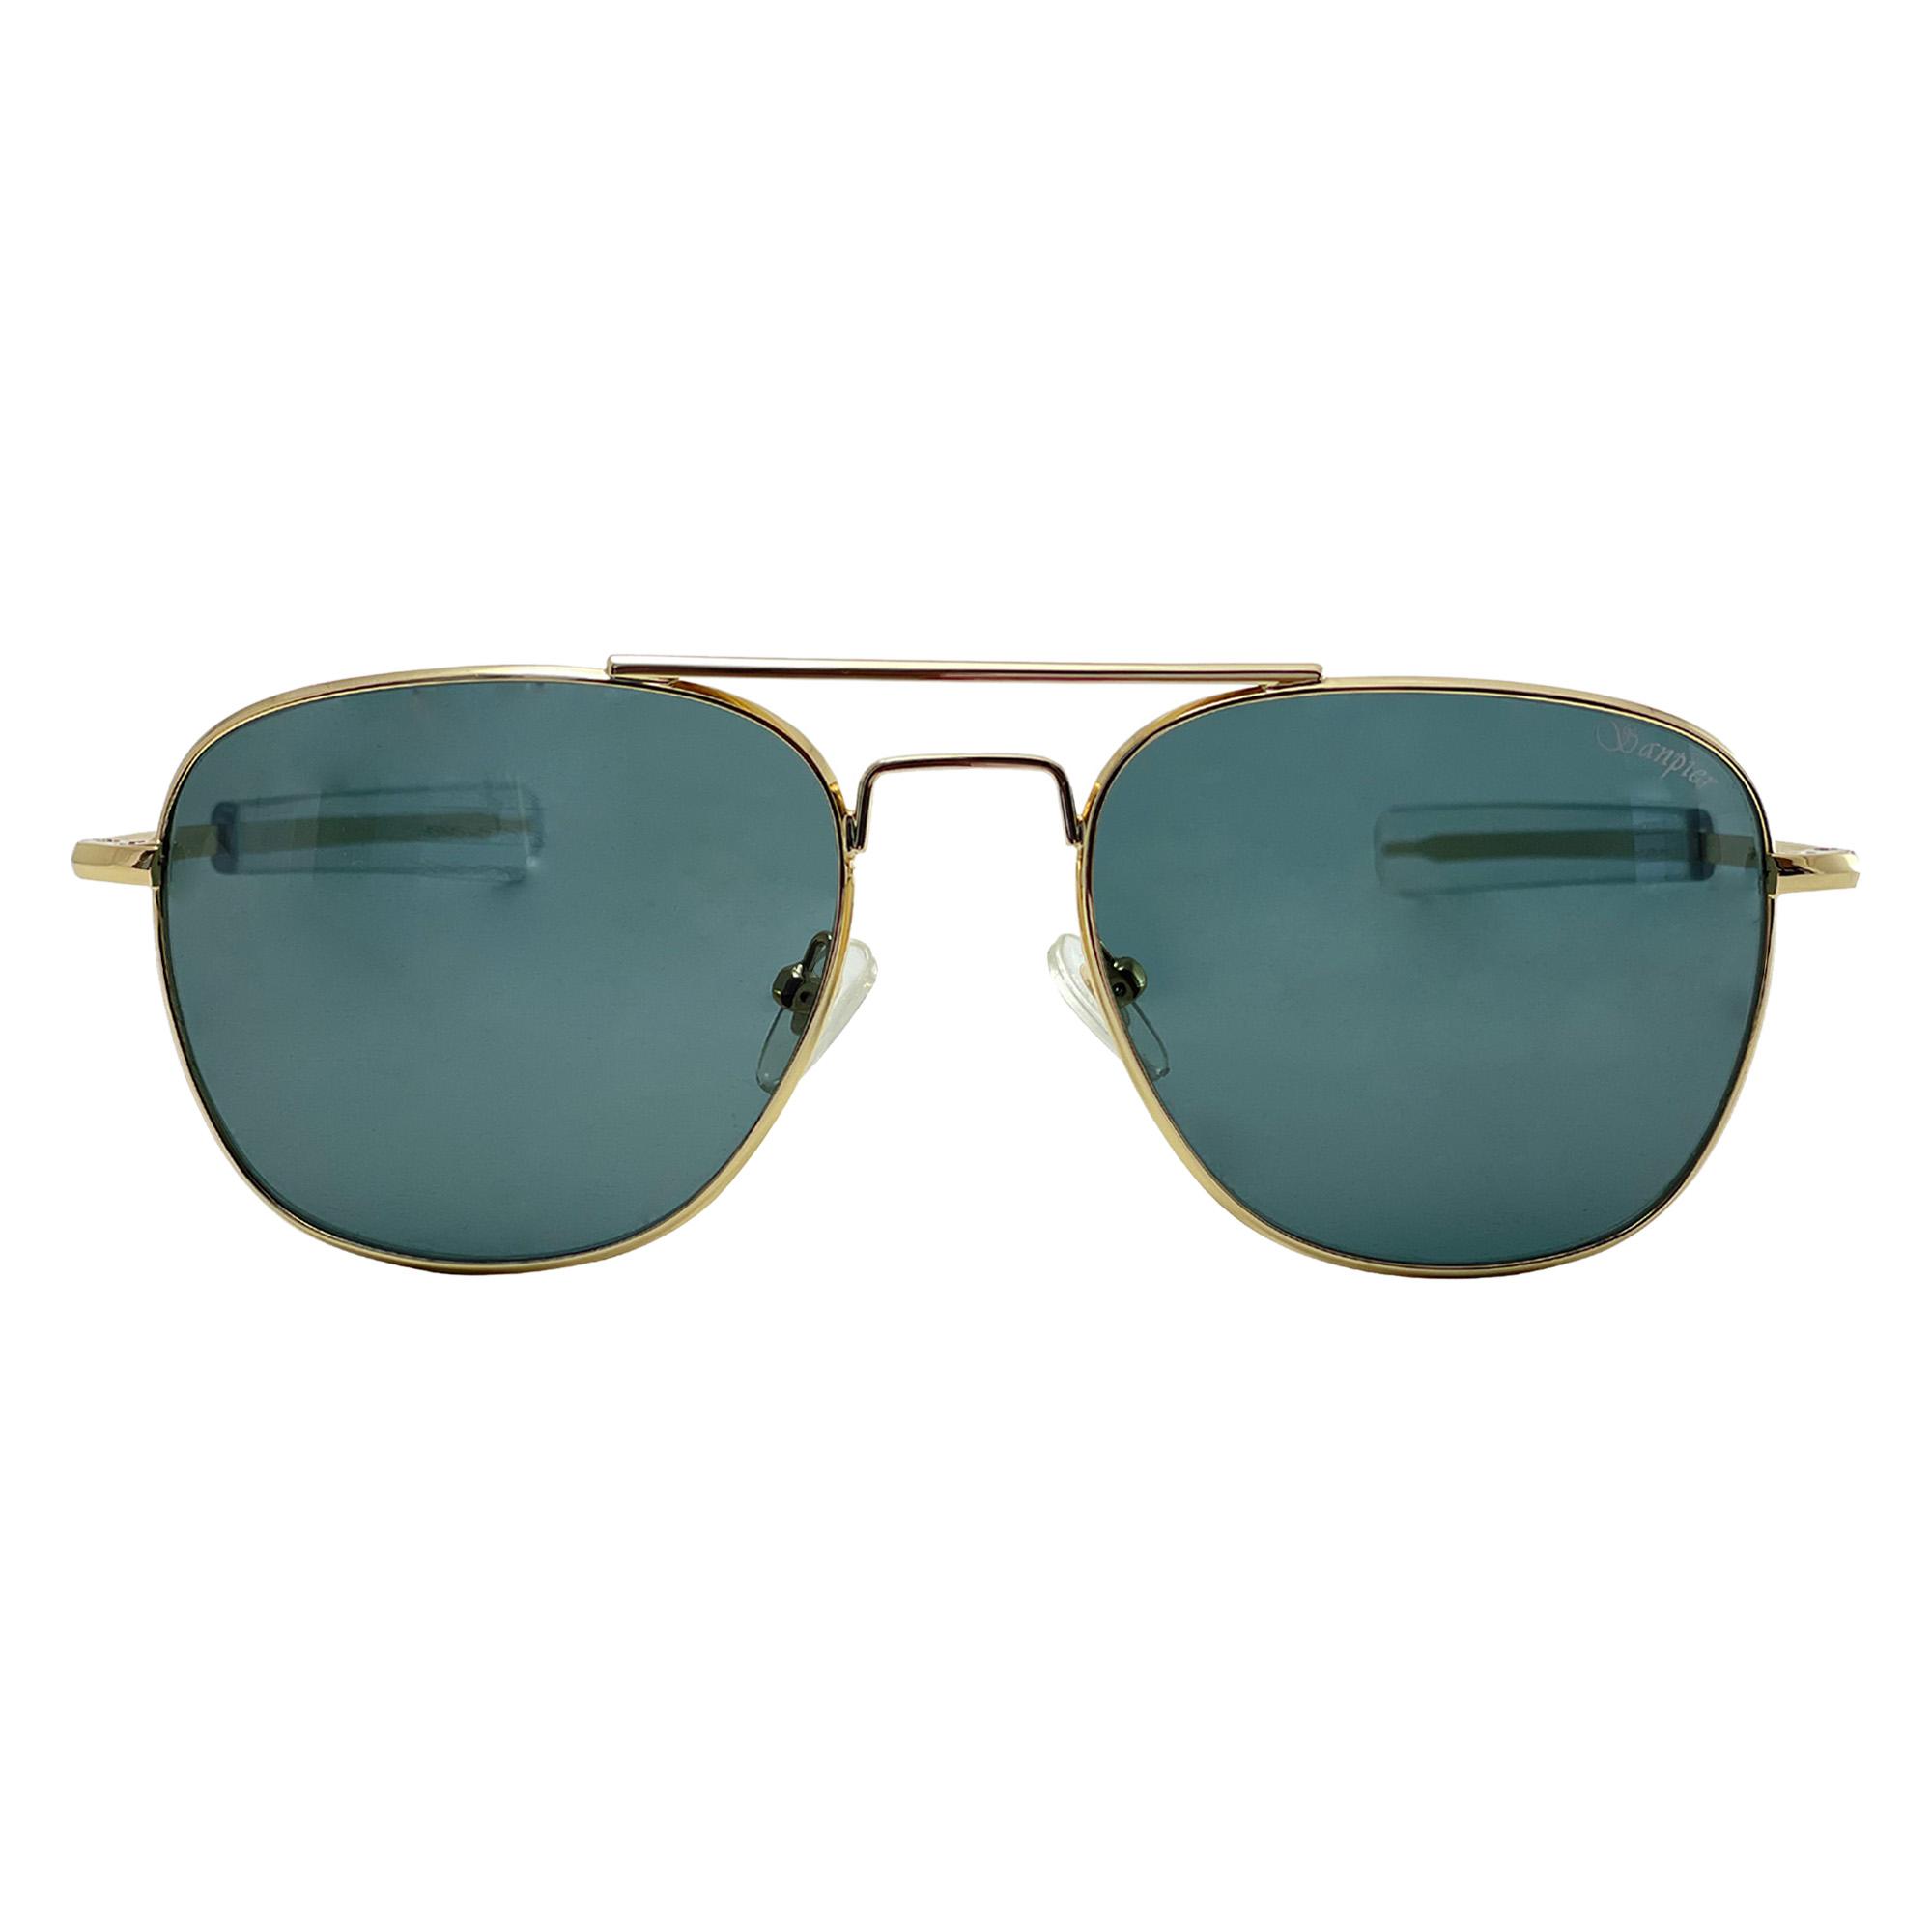 عینک خلبانی دی پانتر DE Panter